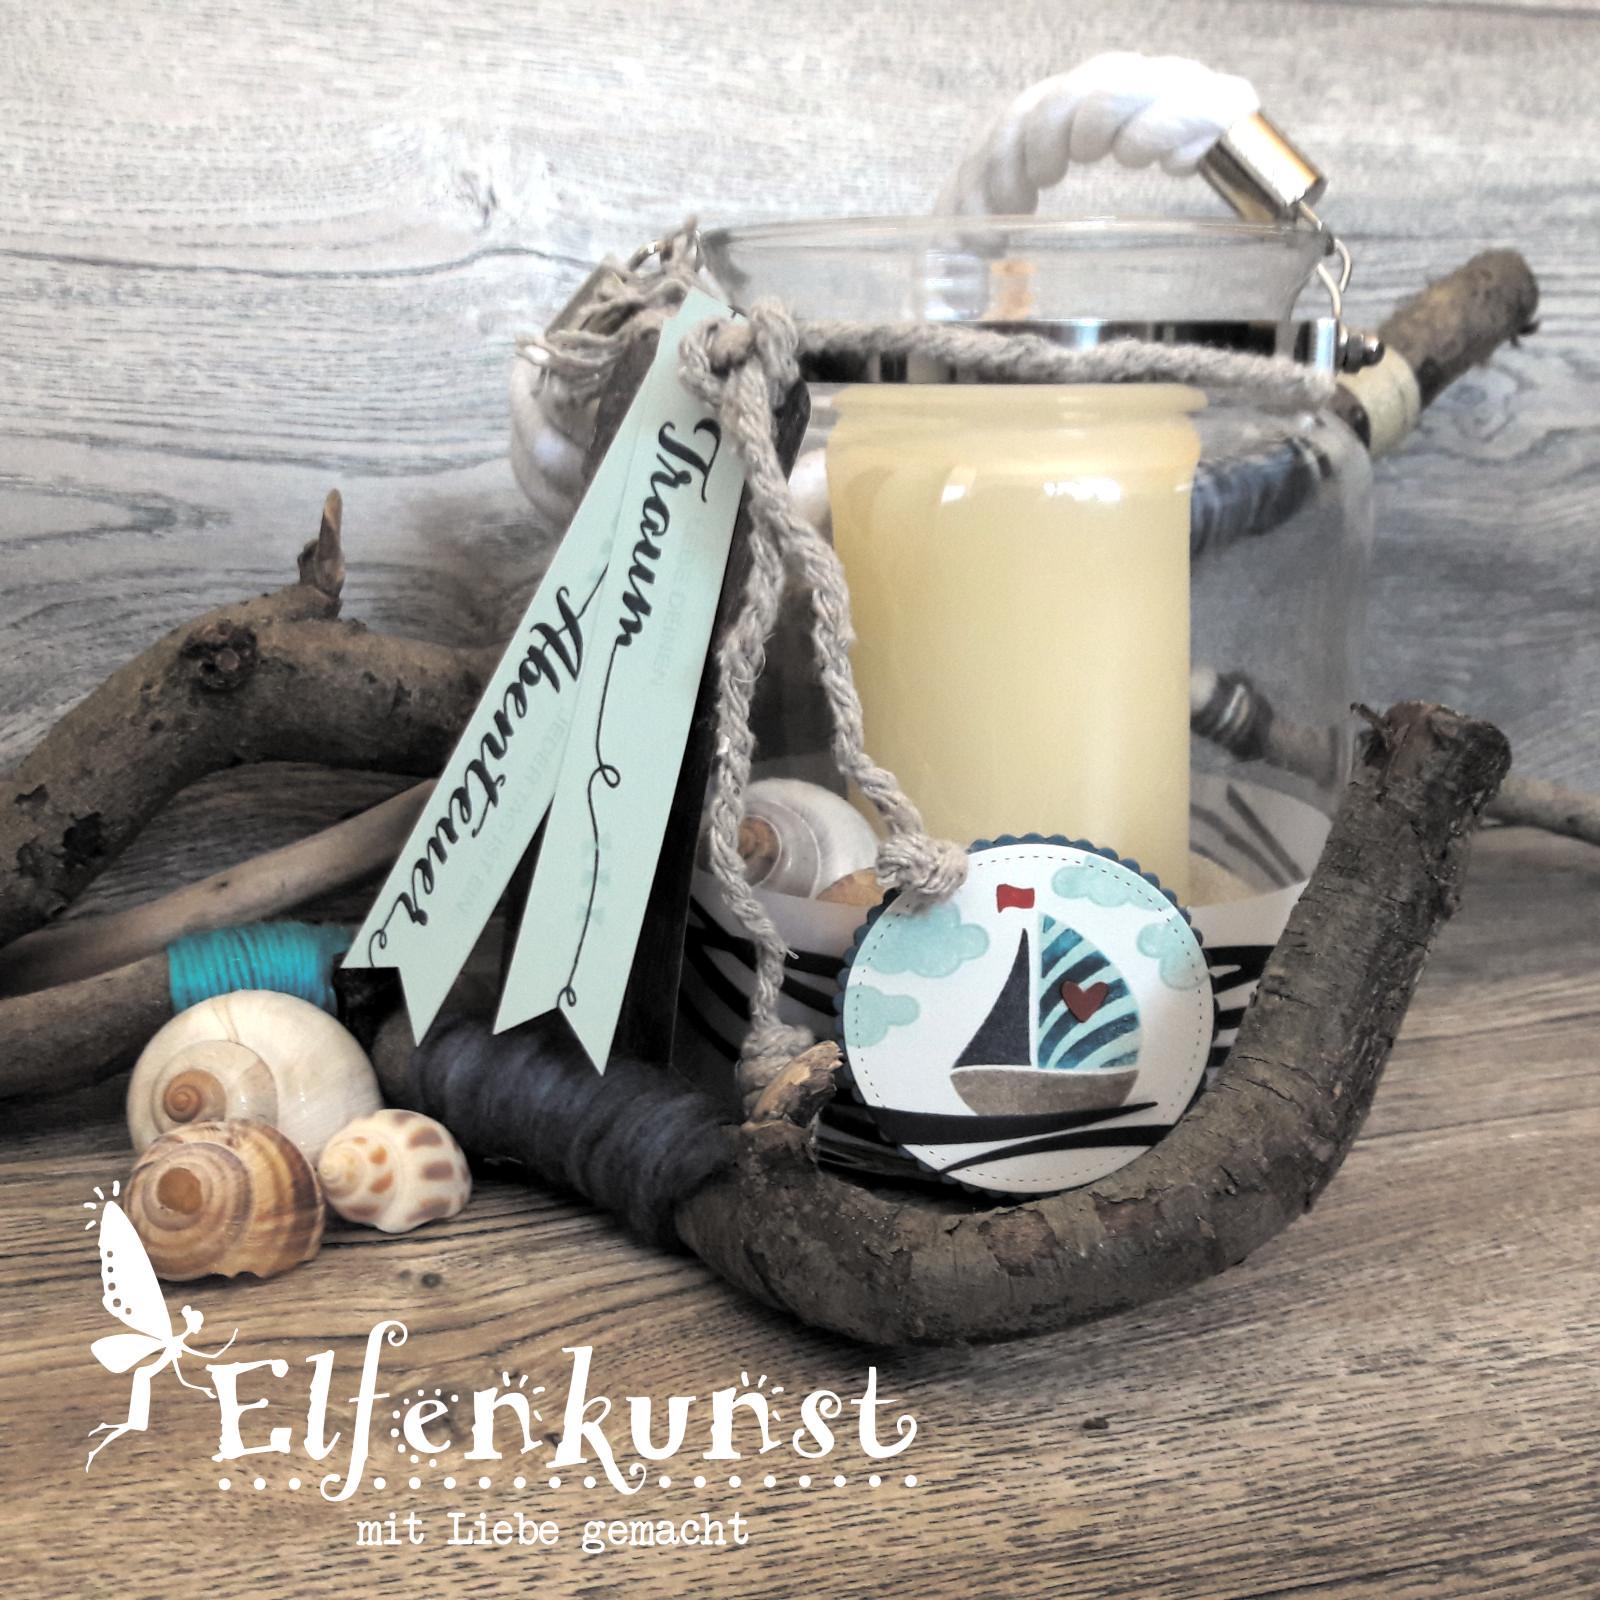 Elfenkunst blog hop neuer katalog for Neuer weltbild katalog